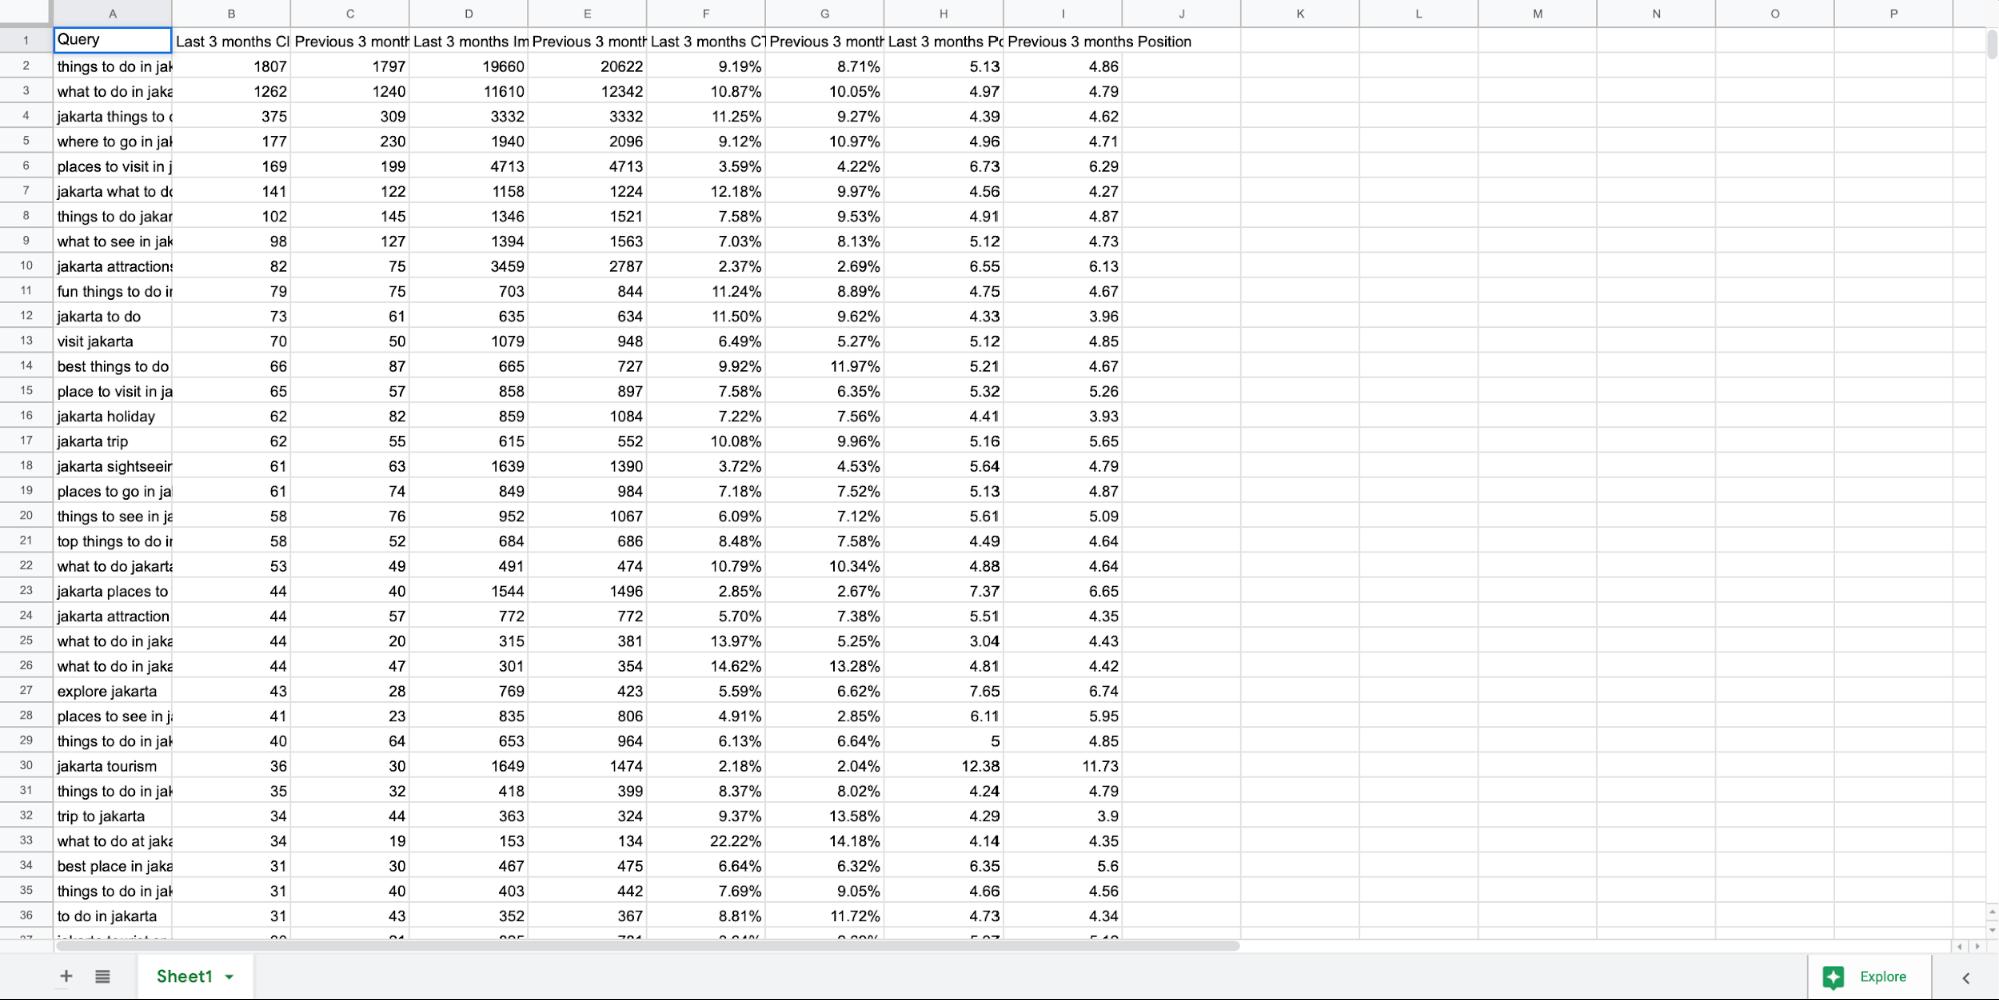 Exporting data to Google Sheets